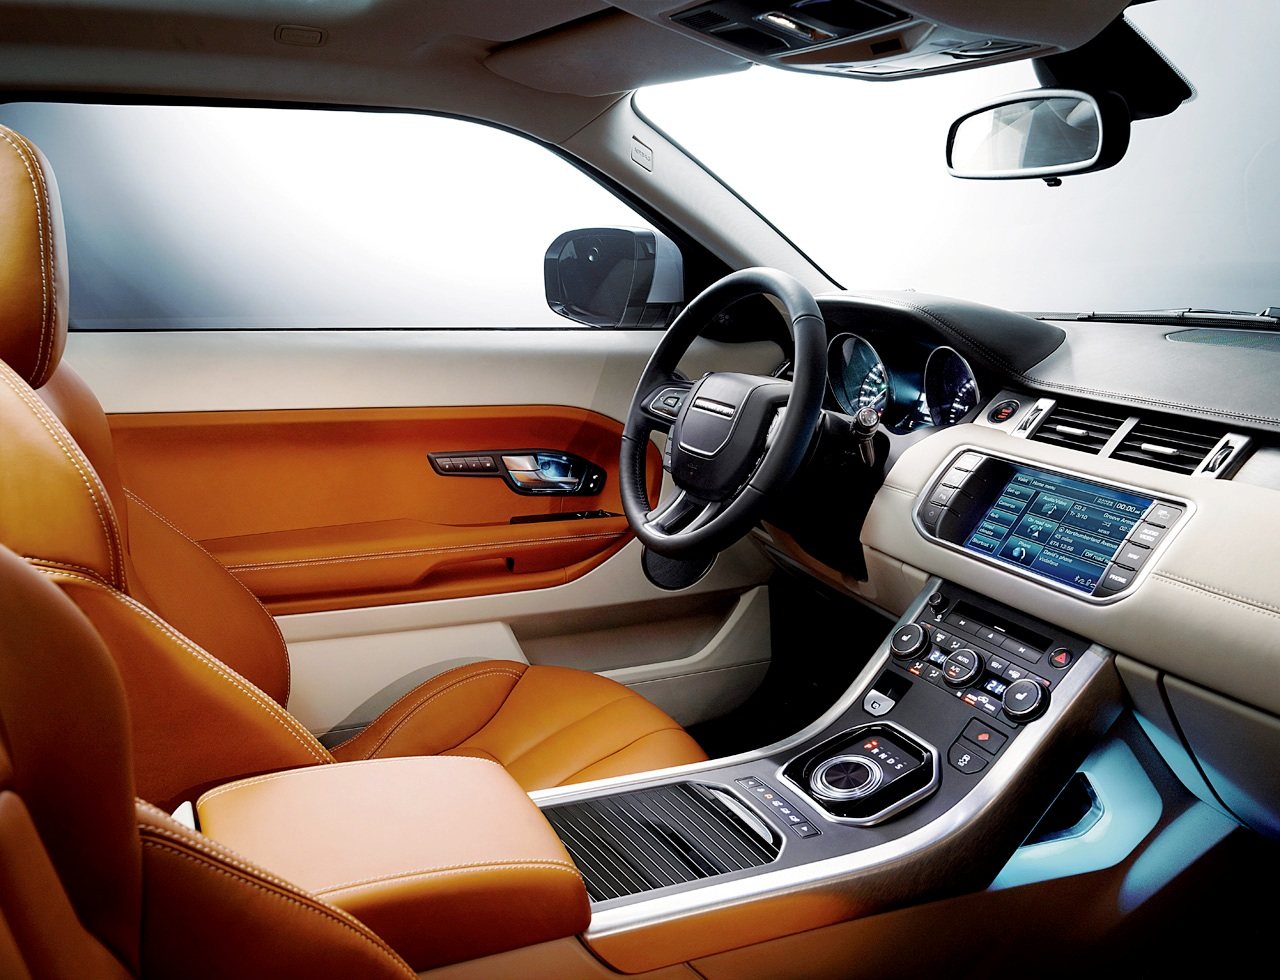 http://2.bp.blogspot.com/-4mN5jKD8v10/TlZILhzrKgI/AAAAAAAAD3I/votxlmNTXXY/s1600/Range-Rover-Evoque-Victoria-Beckham-Special-Edition+%25284%2529.jpg